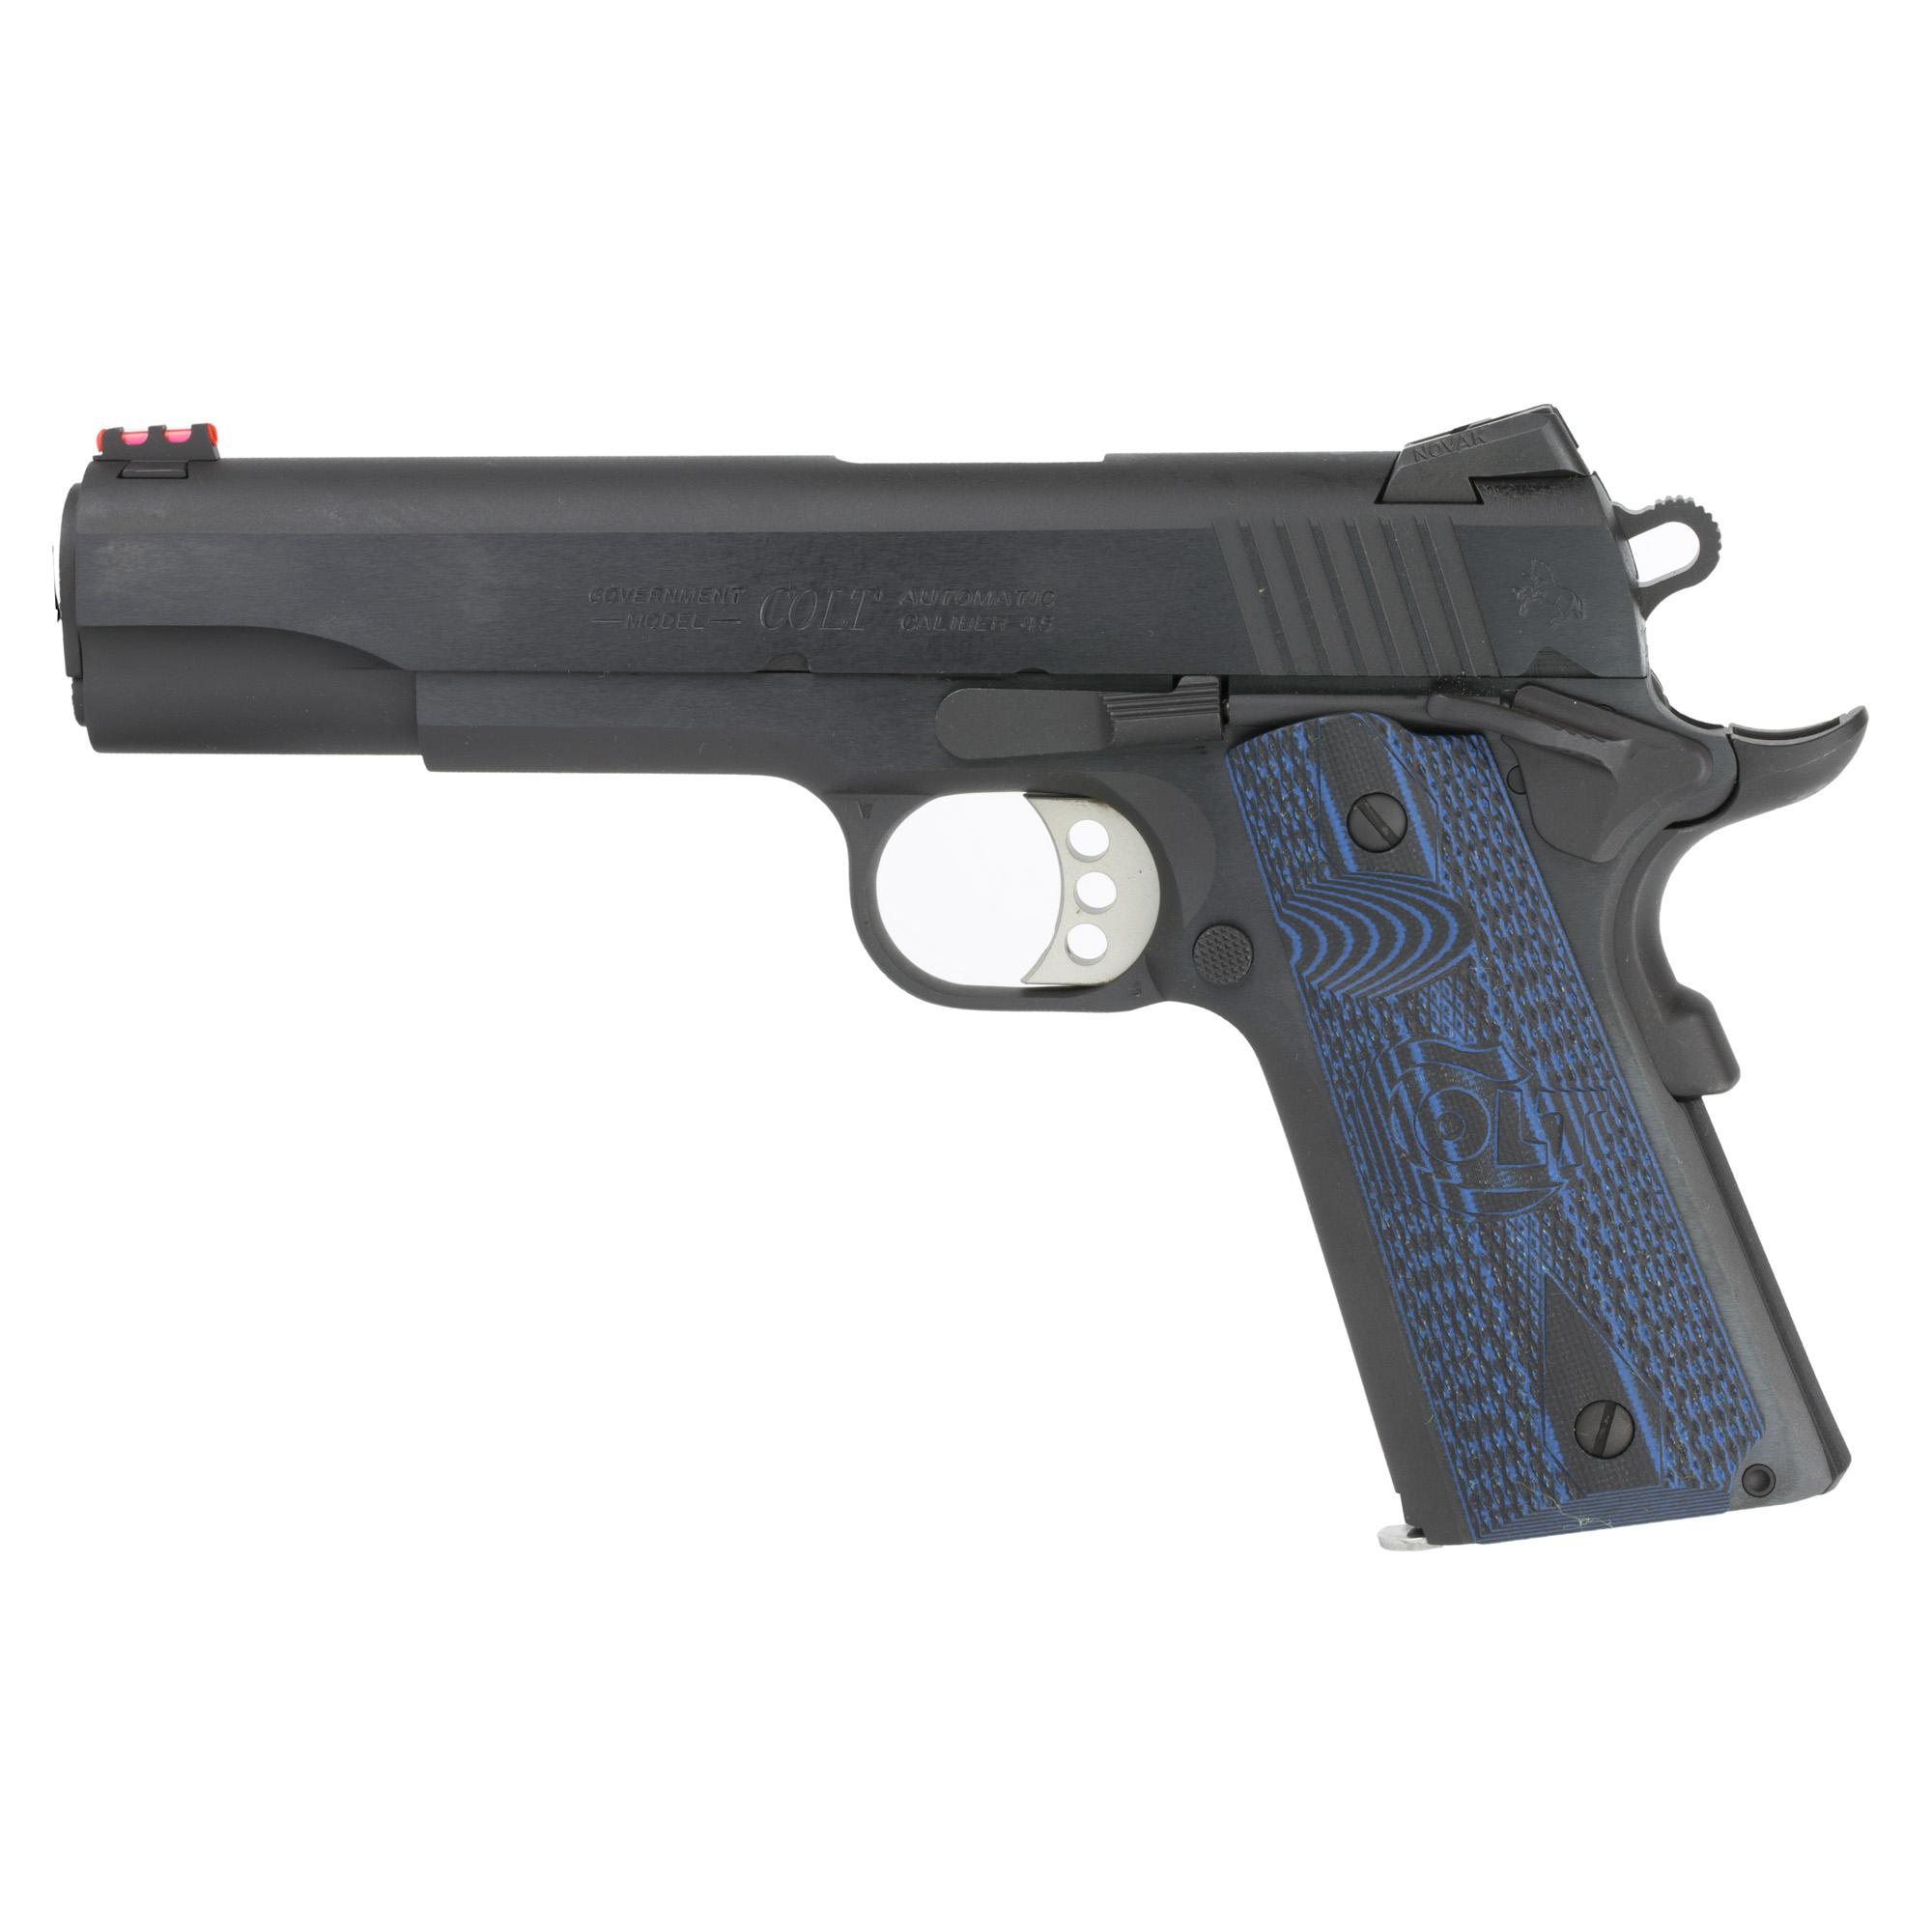 Colt Competition Series, 45ACP - Blue